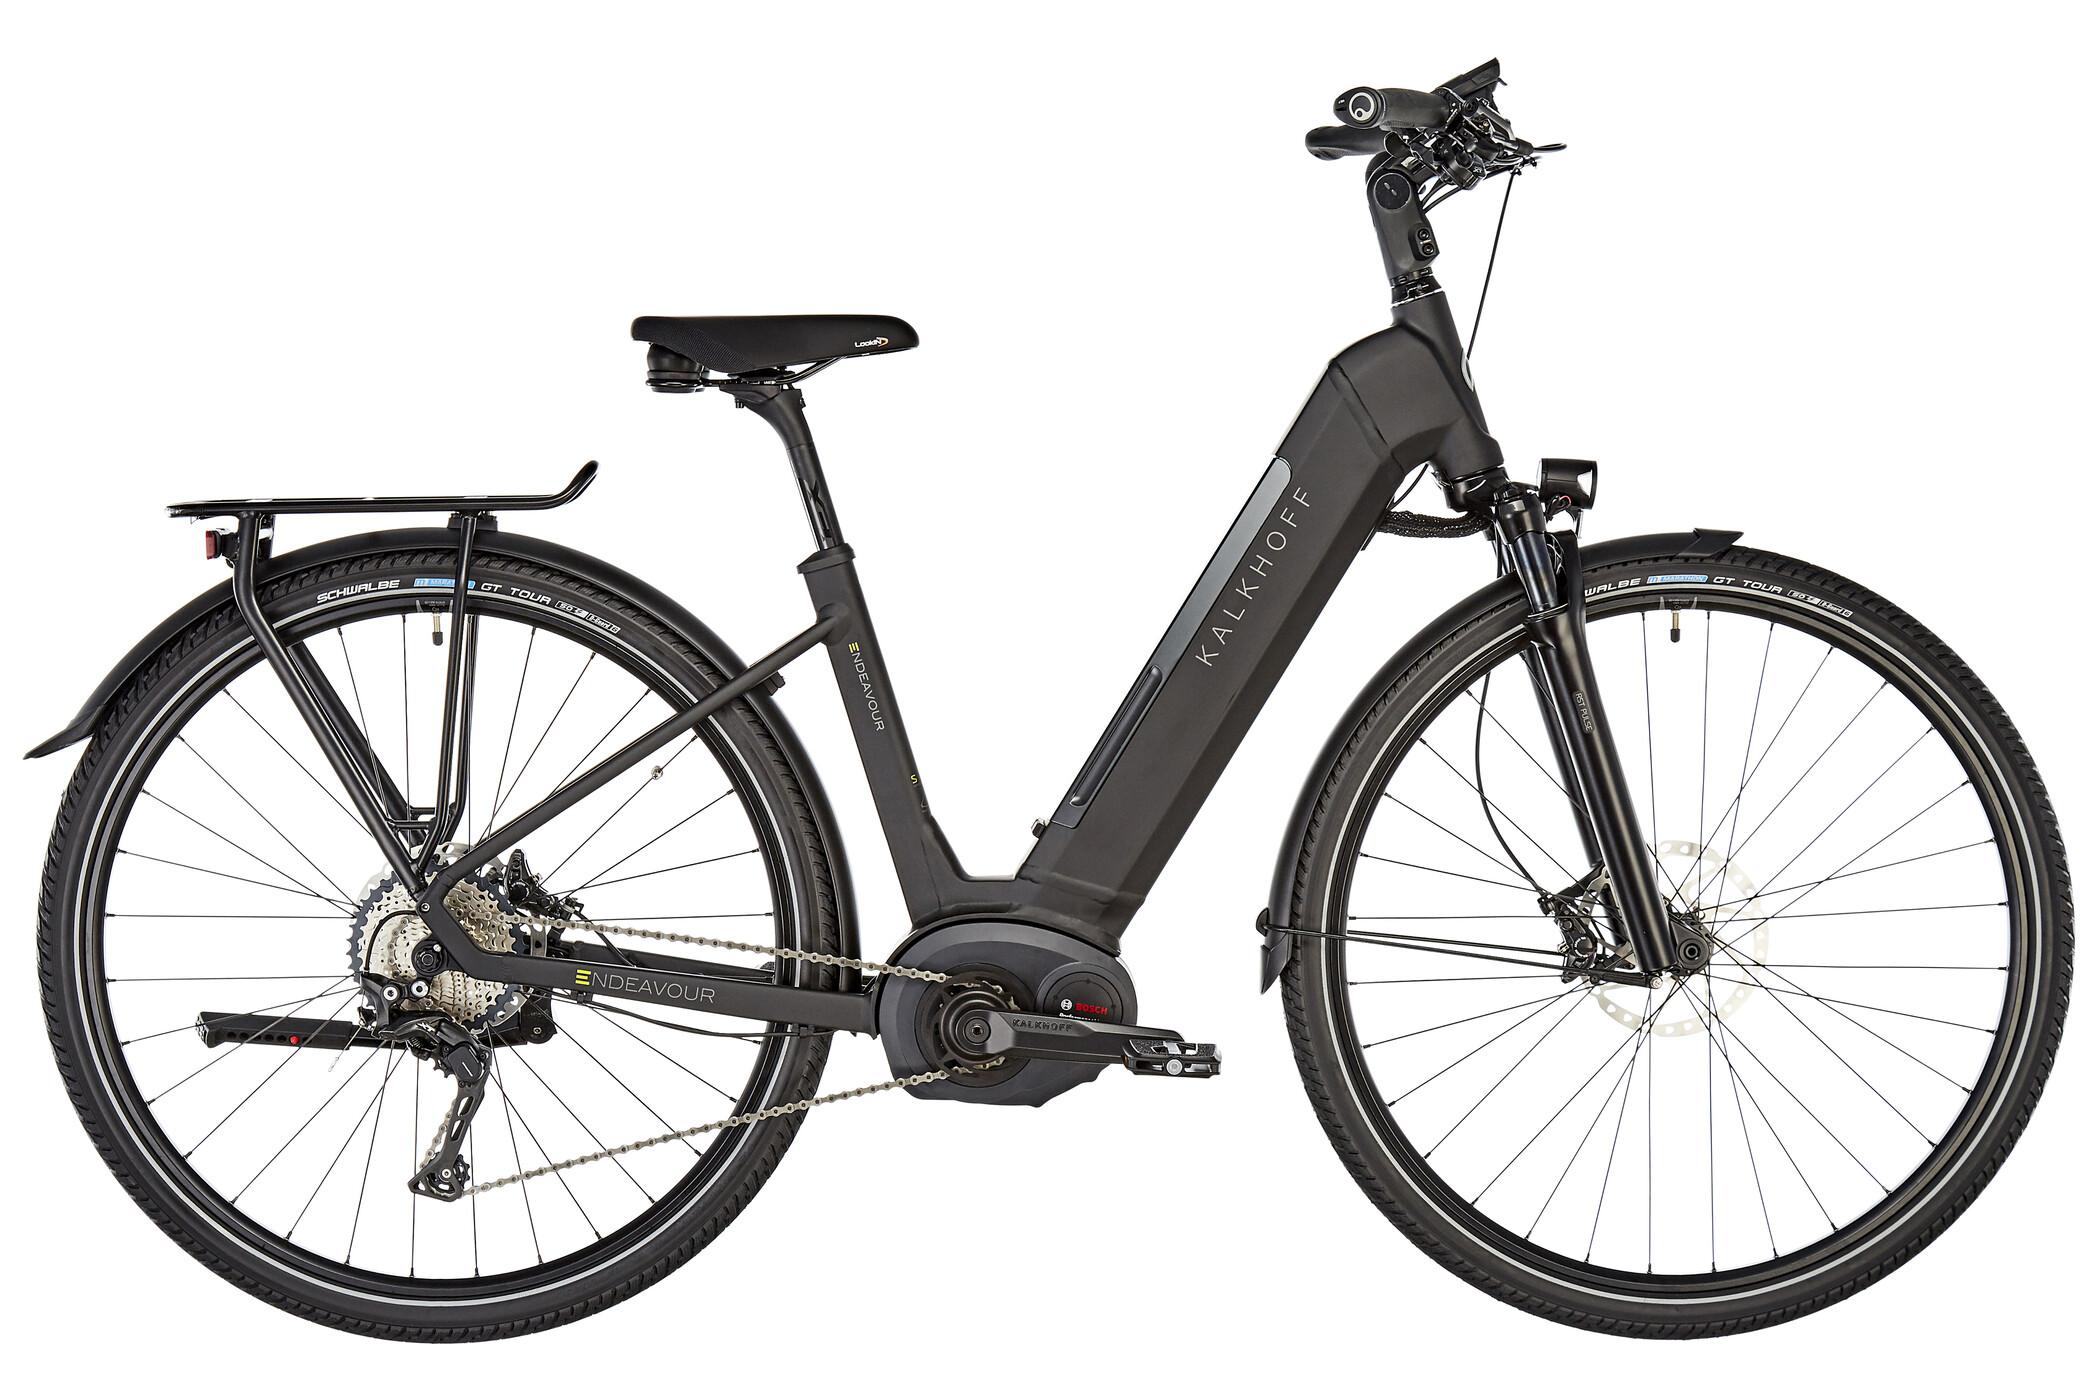 "Kalkhoff Endeavour Excite B11 Wave E-trekkingcykel 28"" 500Wh sort (2019) | City-cykler"